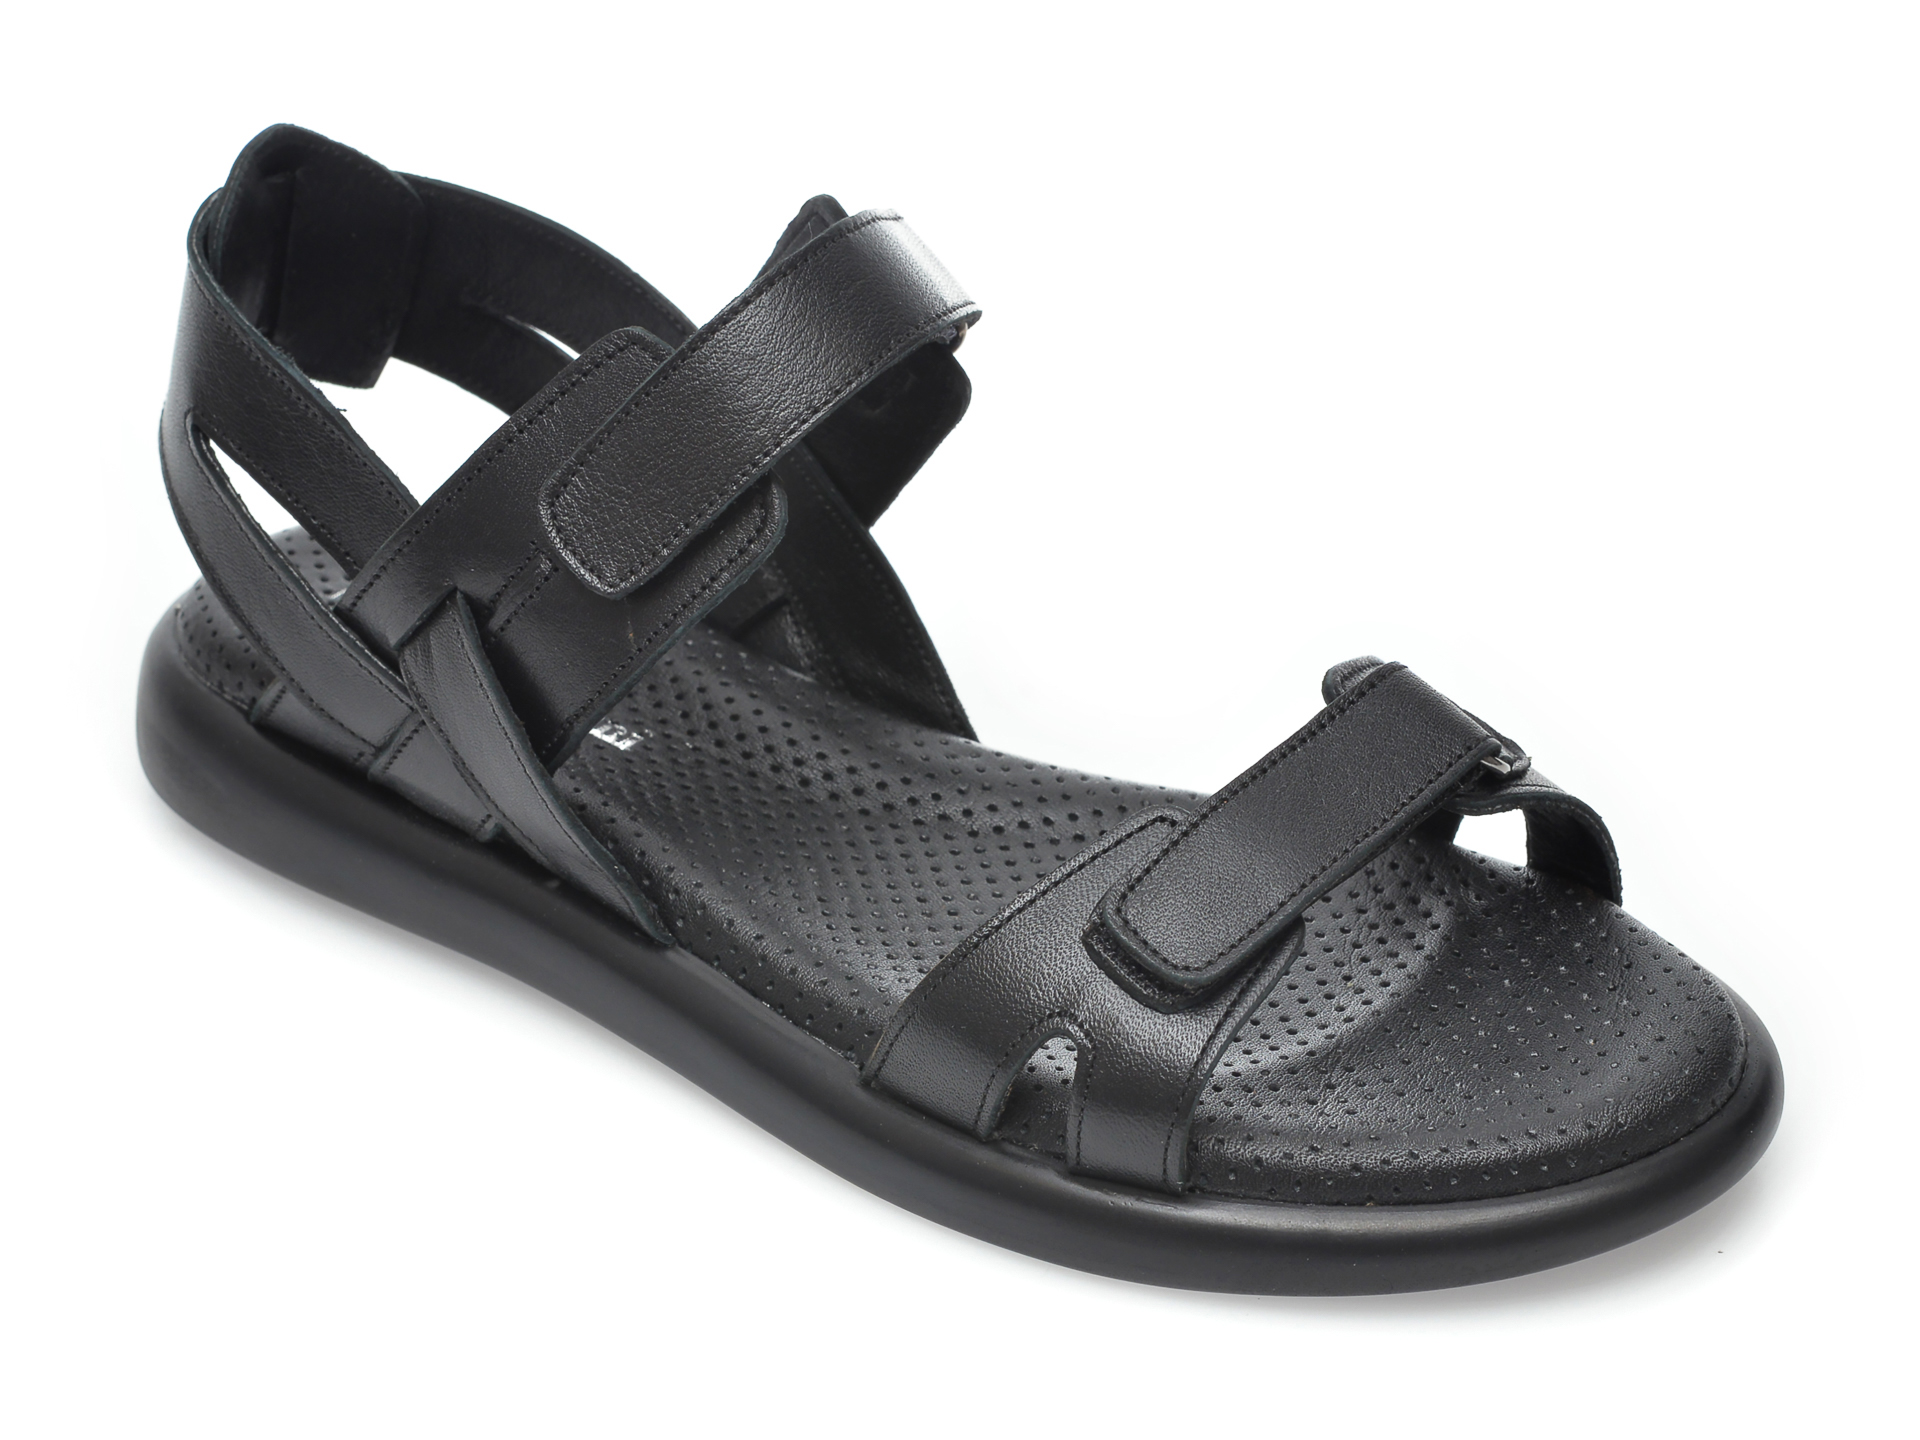 Sandale FLAVIA PASSINI negre, 4940, din piele naturala imagine otter.ro 2021